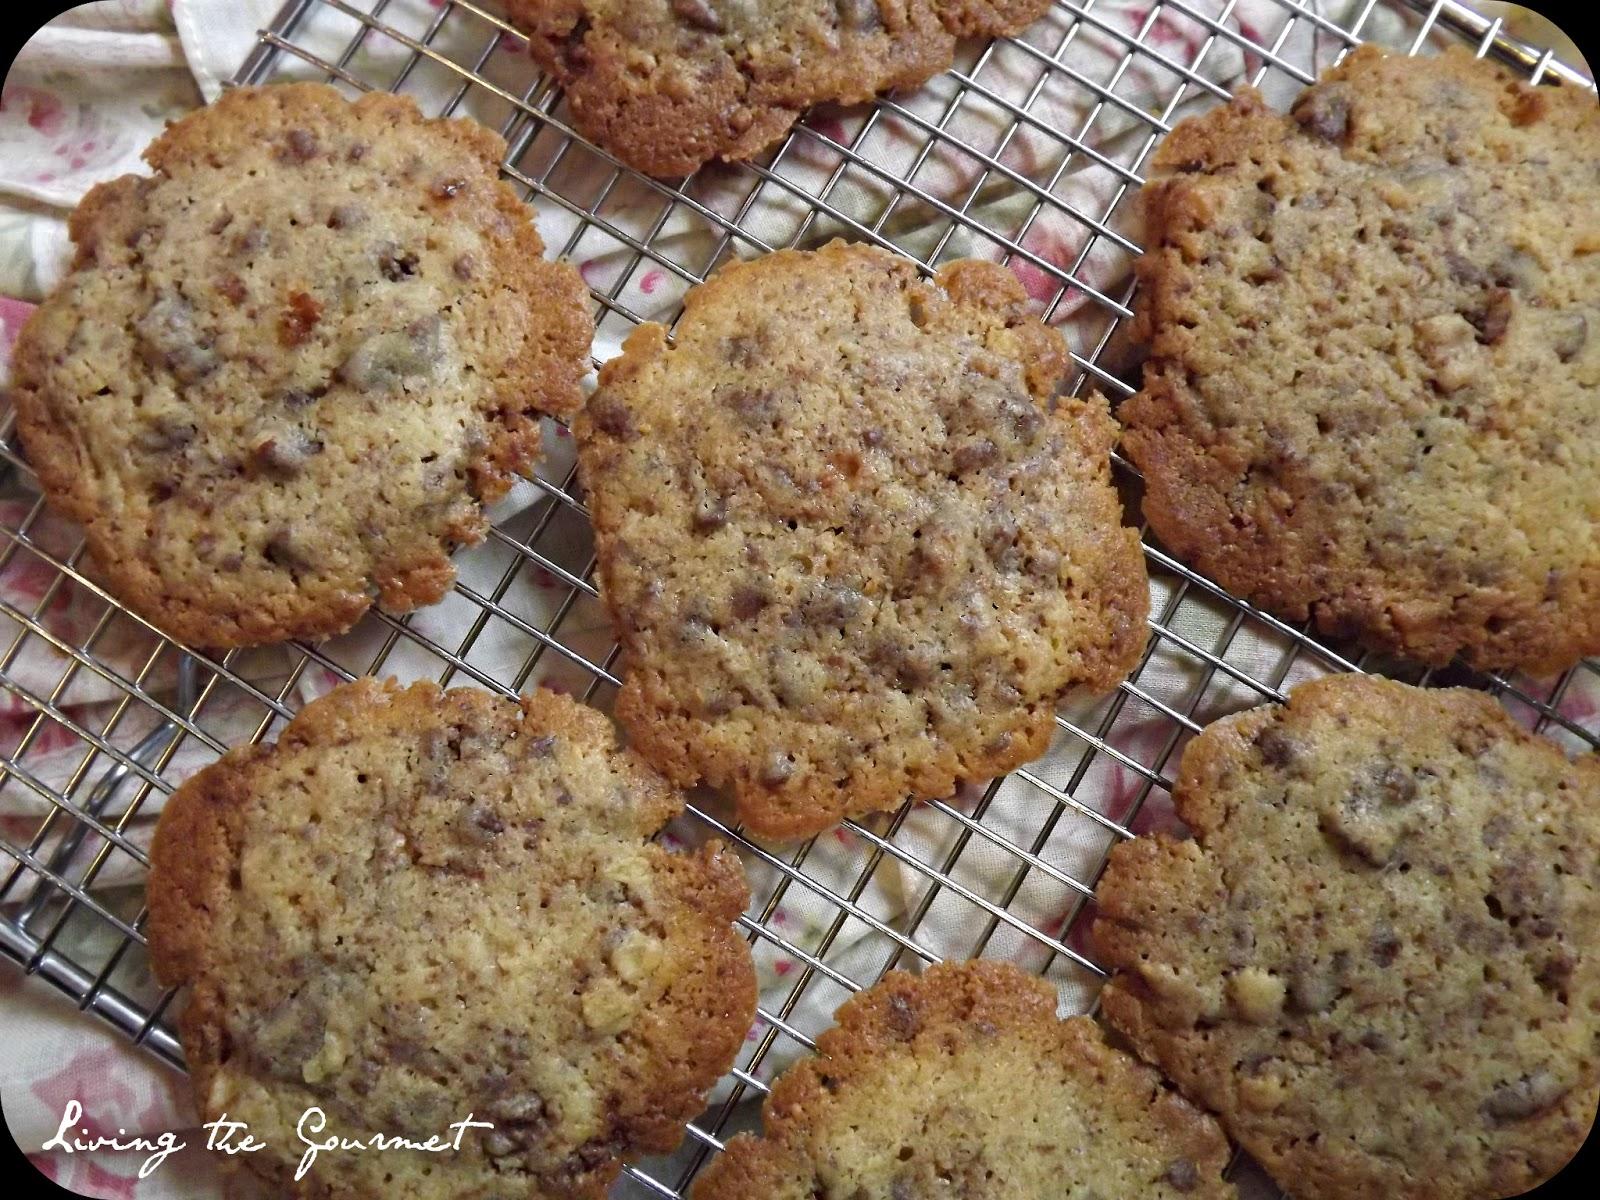 Living the Gourmet: Potato Chip Cookies